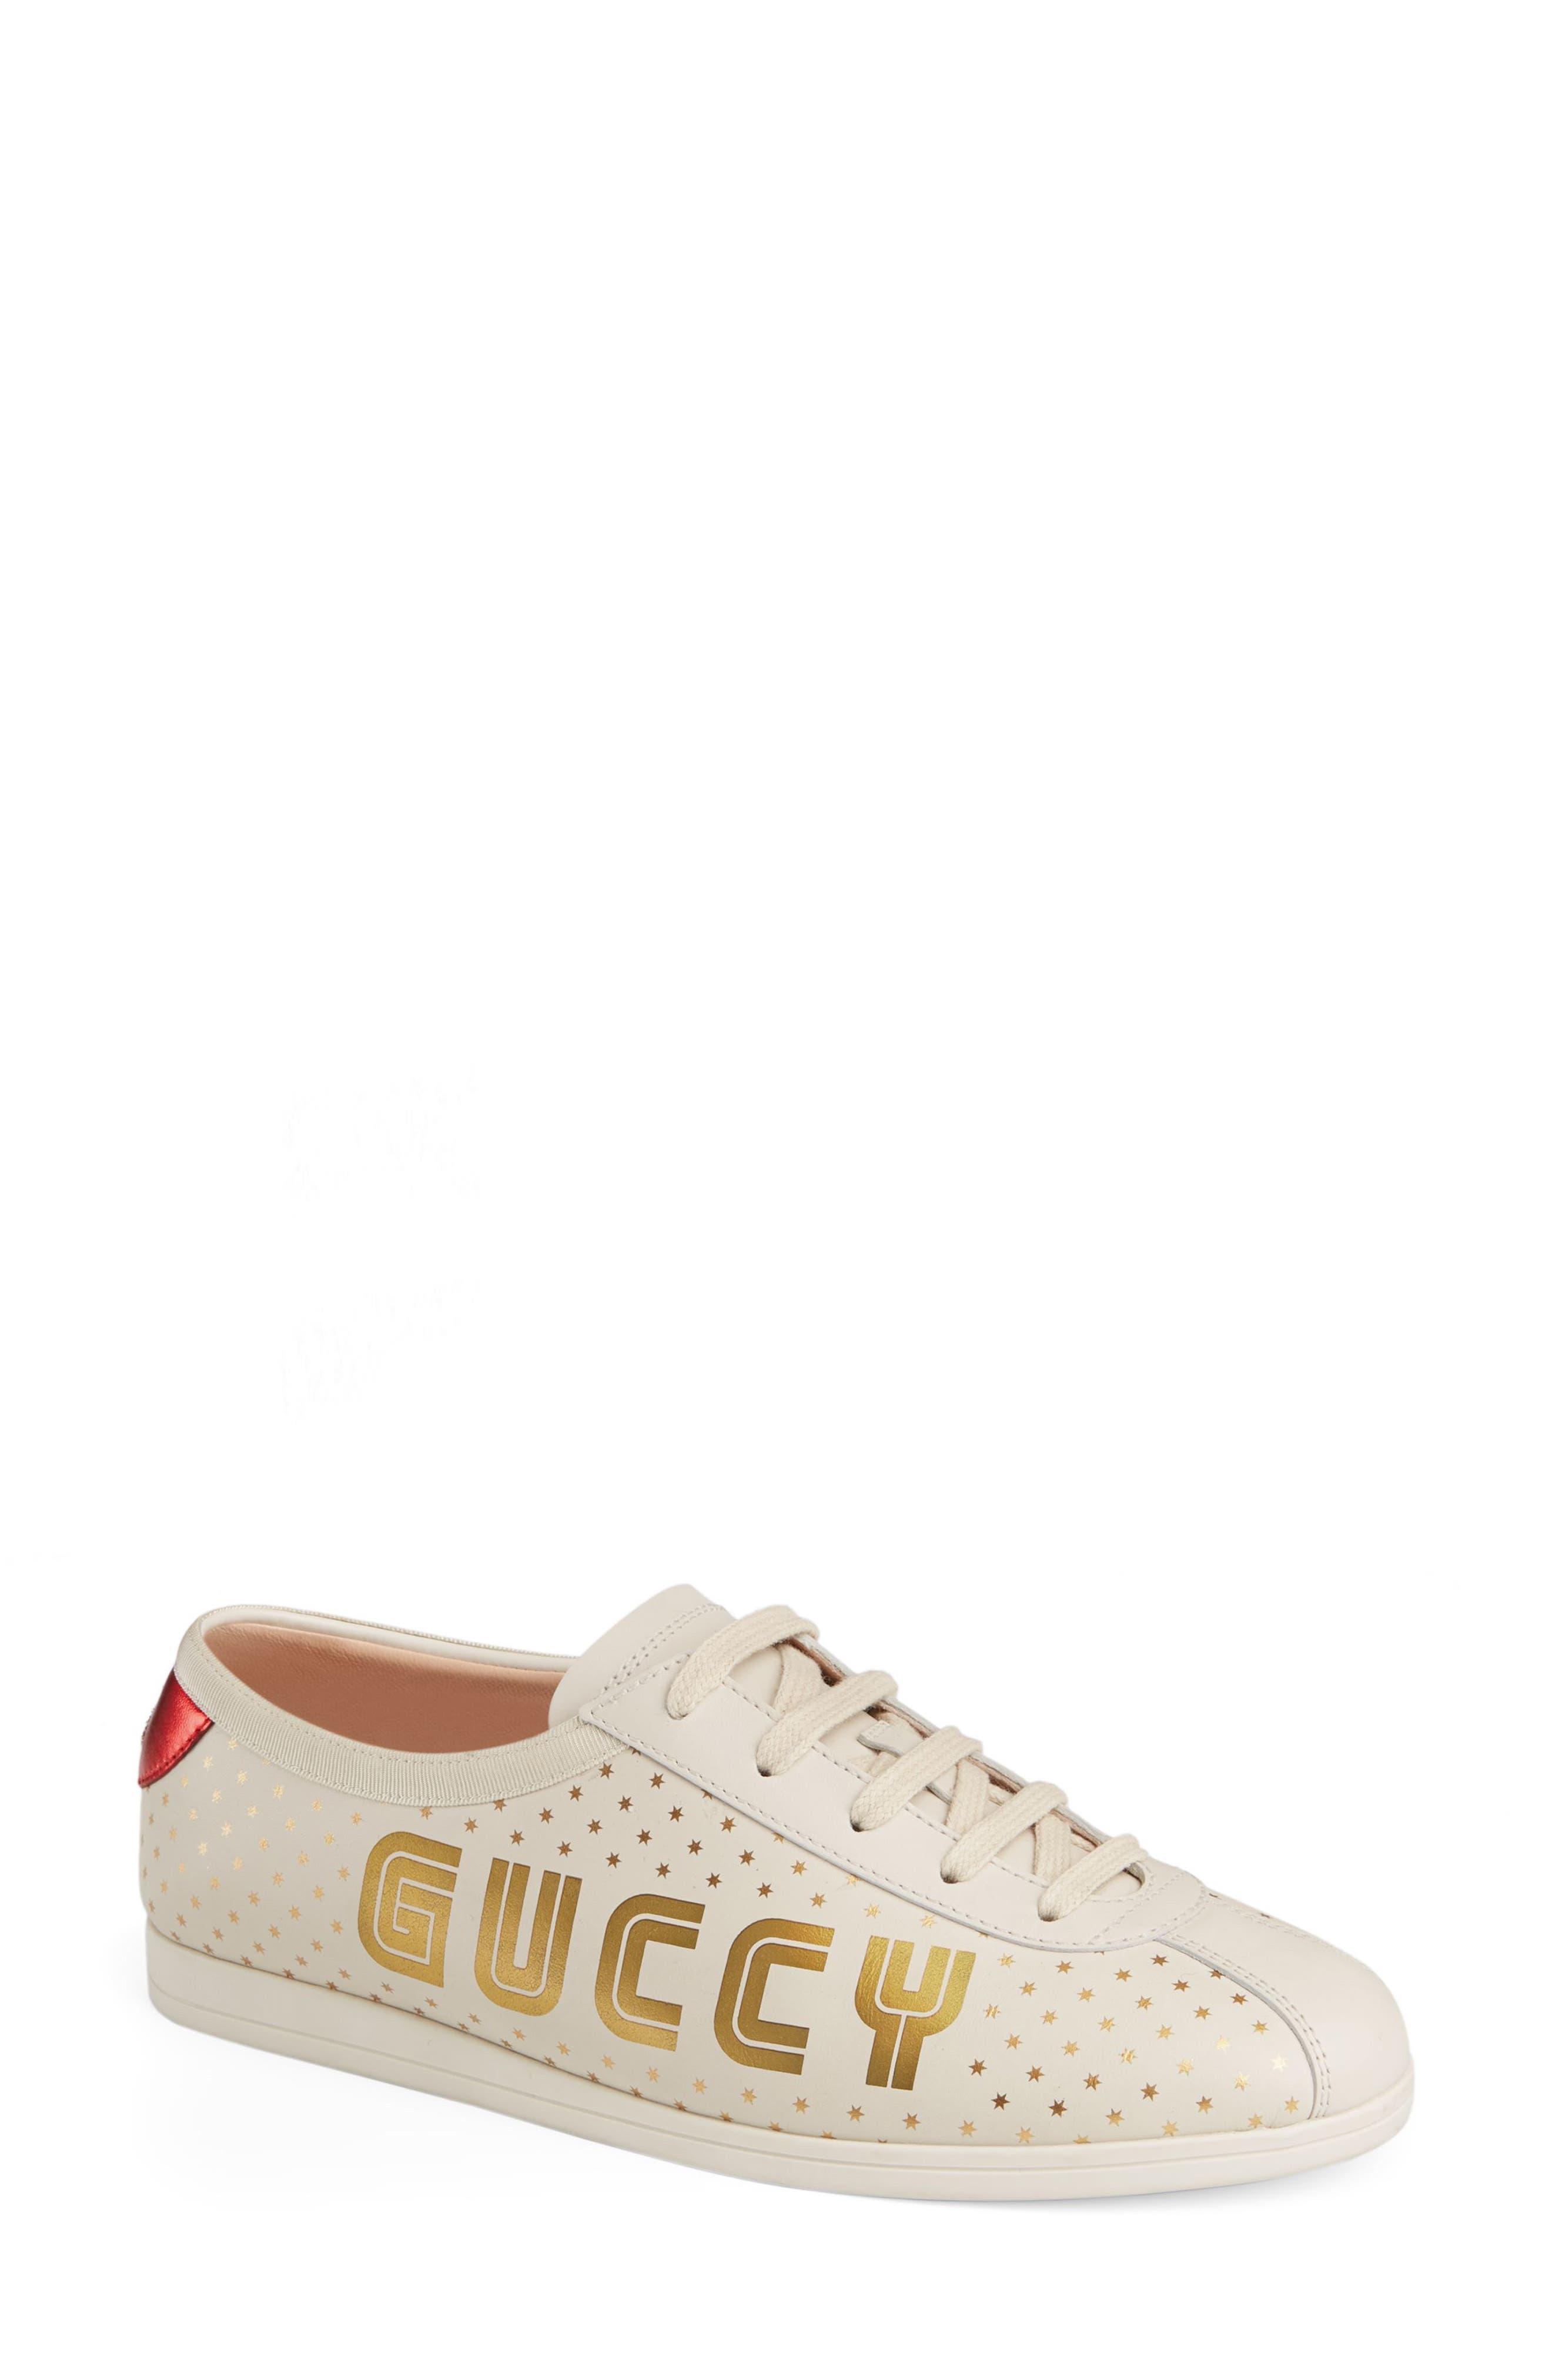 Falacer Guccy Logo Sneaker,                             Main thumbnail 1, color,                             White